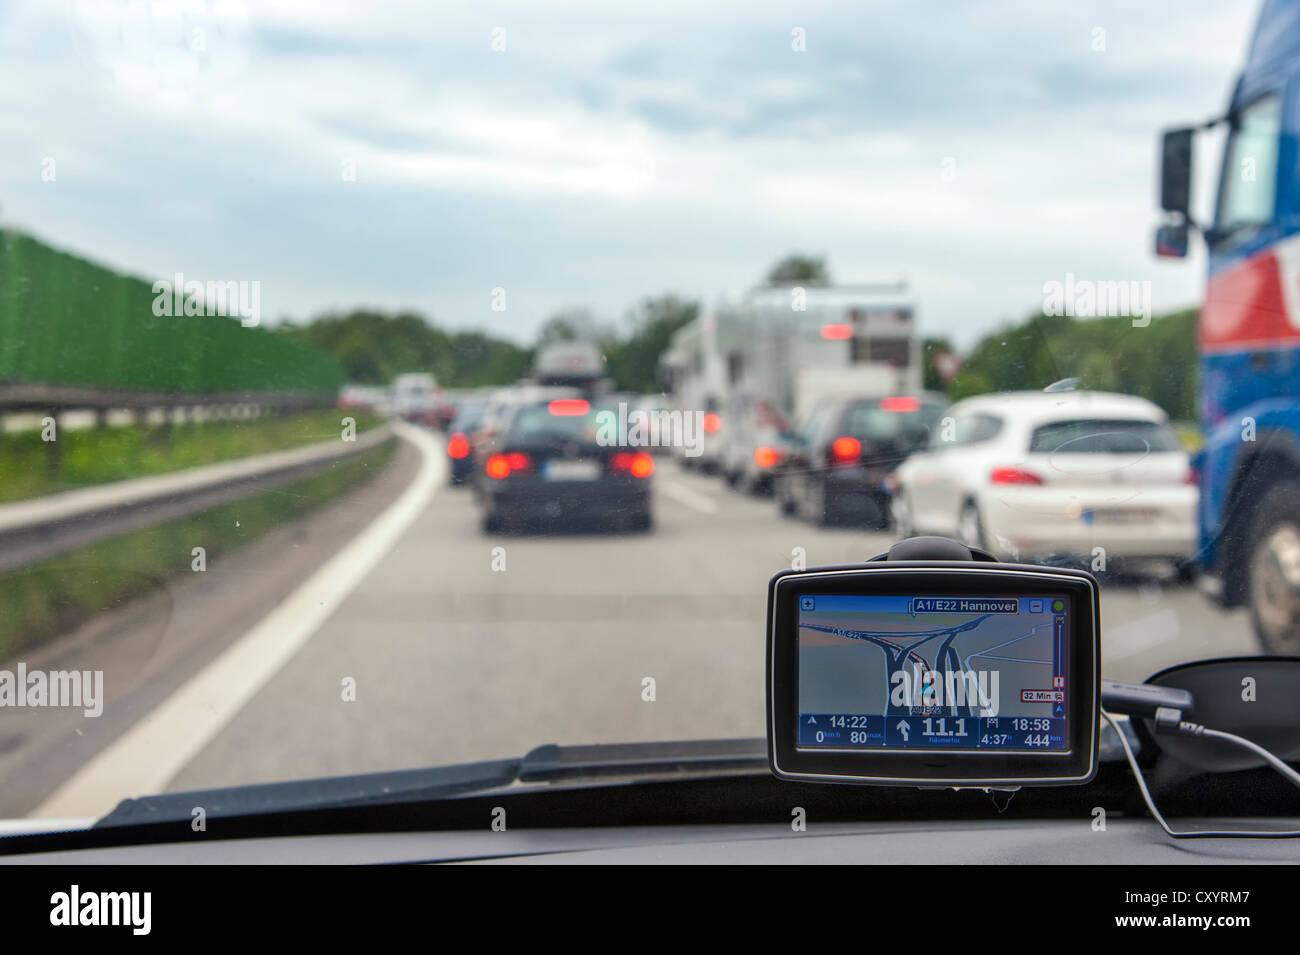 Stationary vehicles in a traffic jam on the motorway, Autobahn, Hamburg - Stock Image